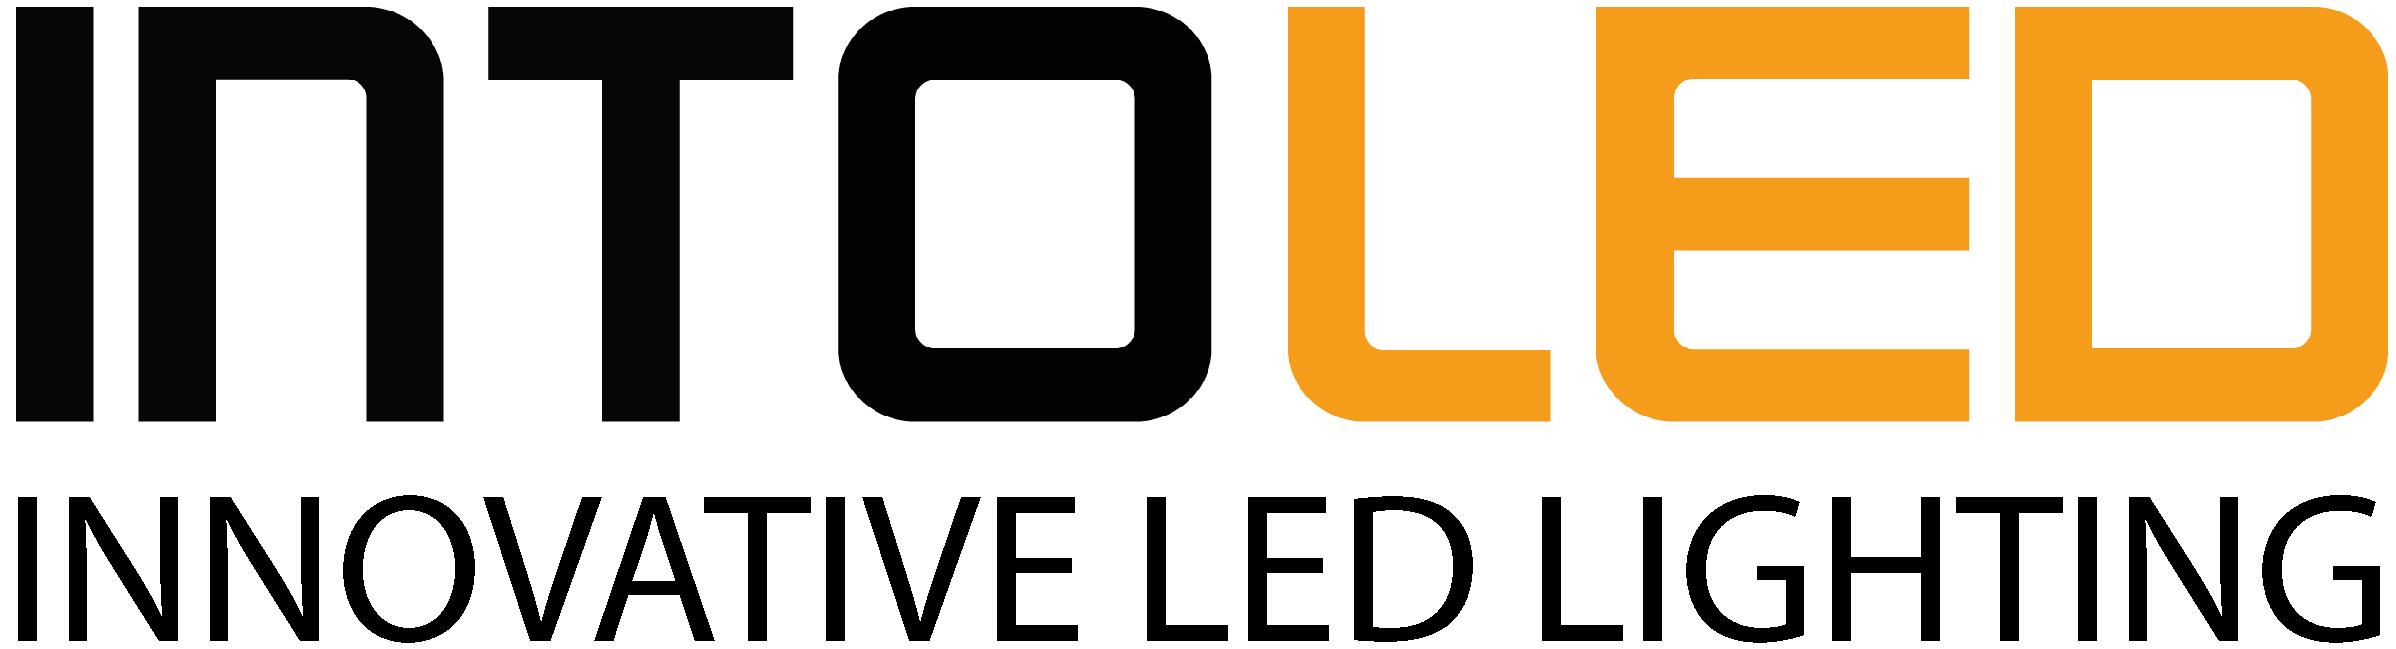 INTOLED | Innovative LED Lighting